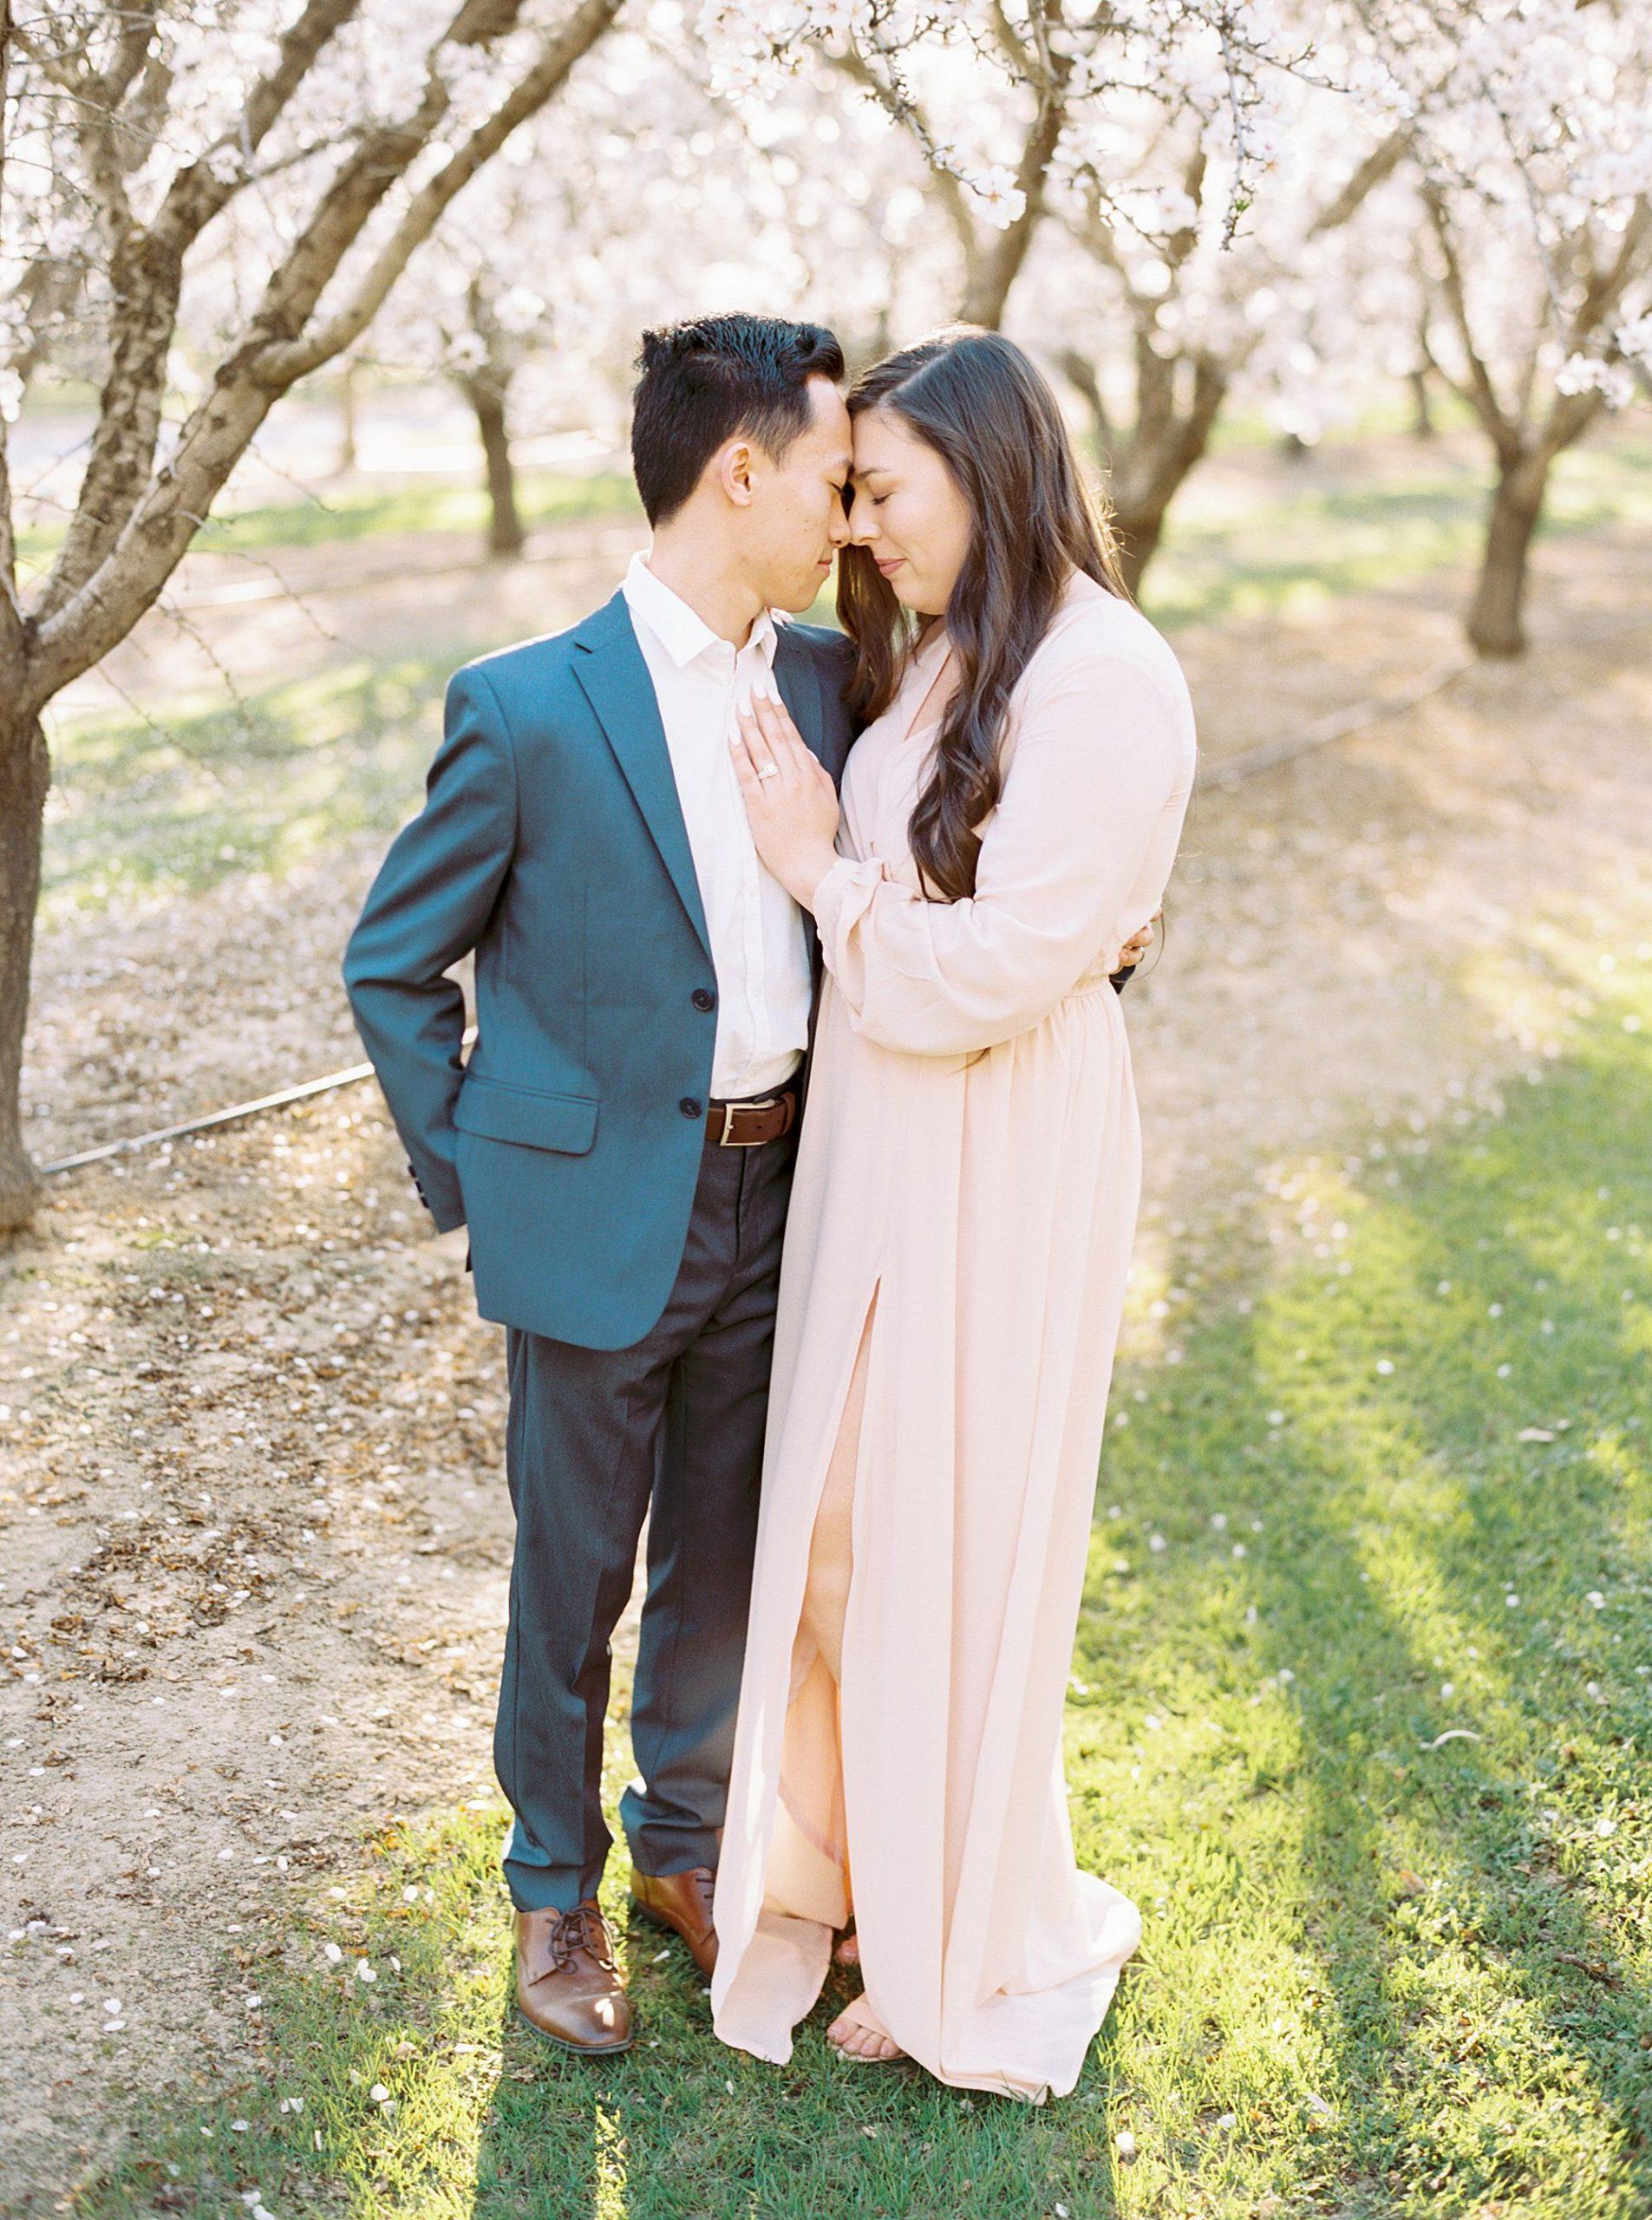 Almond Orchard Engagement Session - Caley and Tyler - Lone Oak Wedding - Ashley Baumgartner - Almond Blossom_0010.jpg